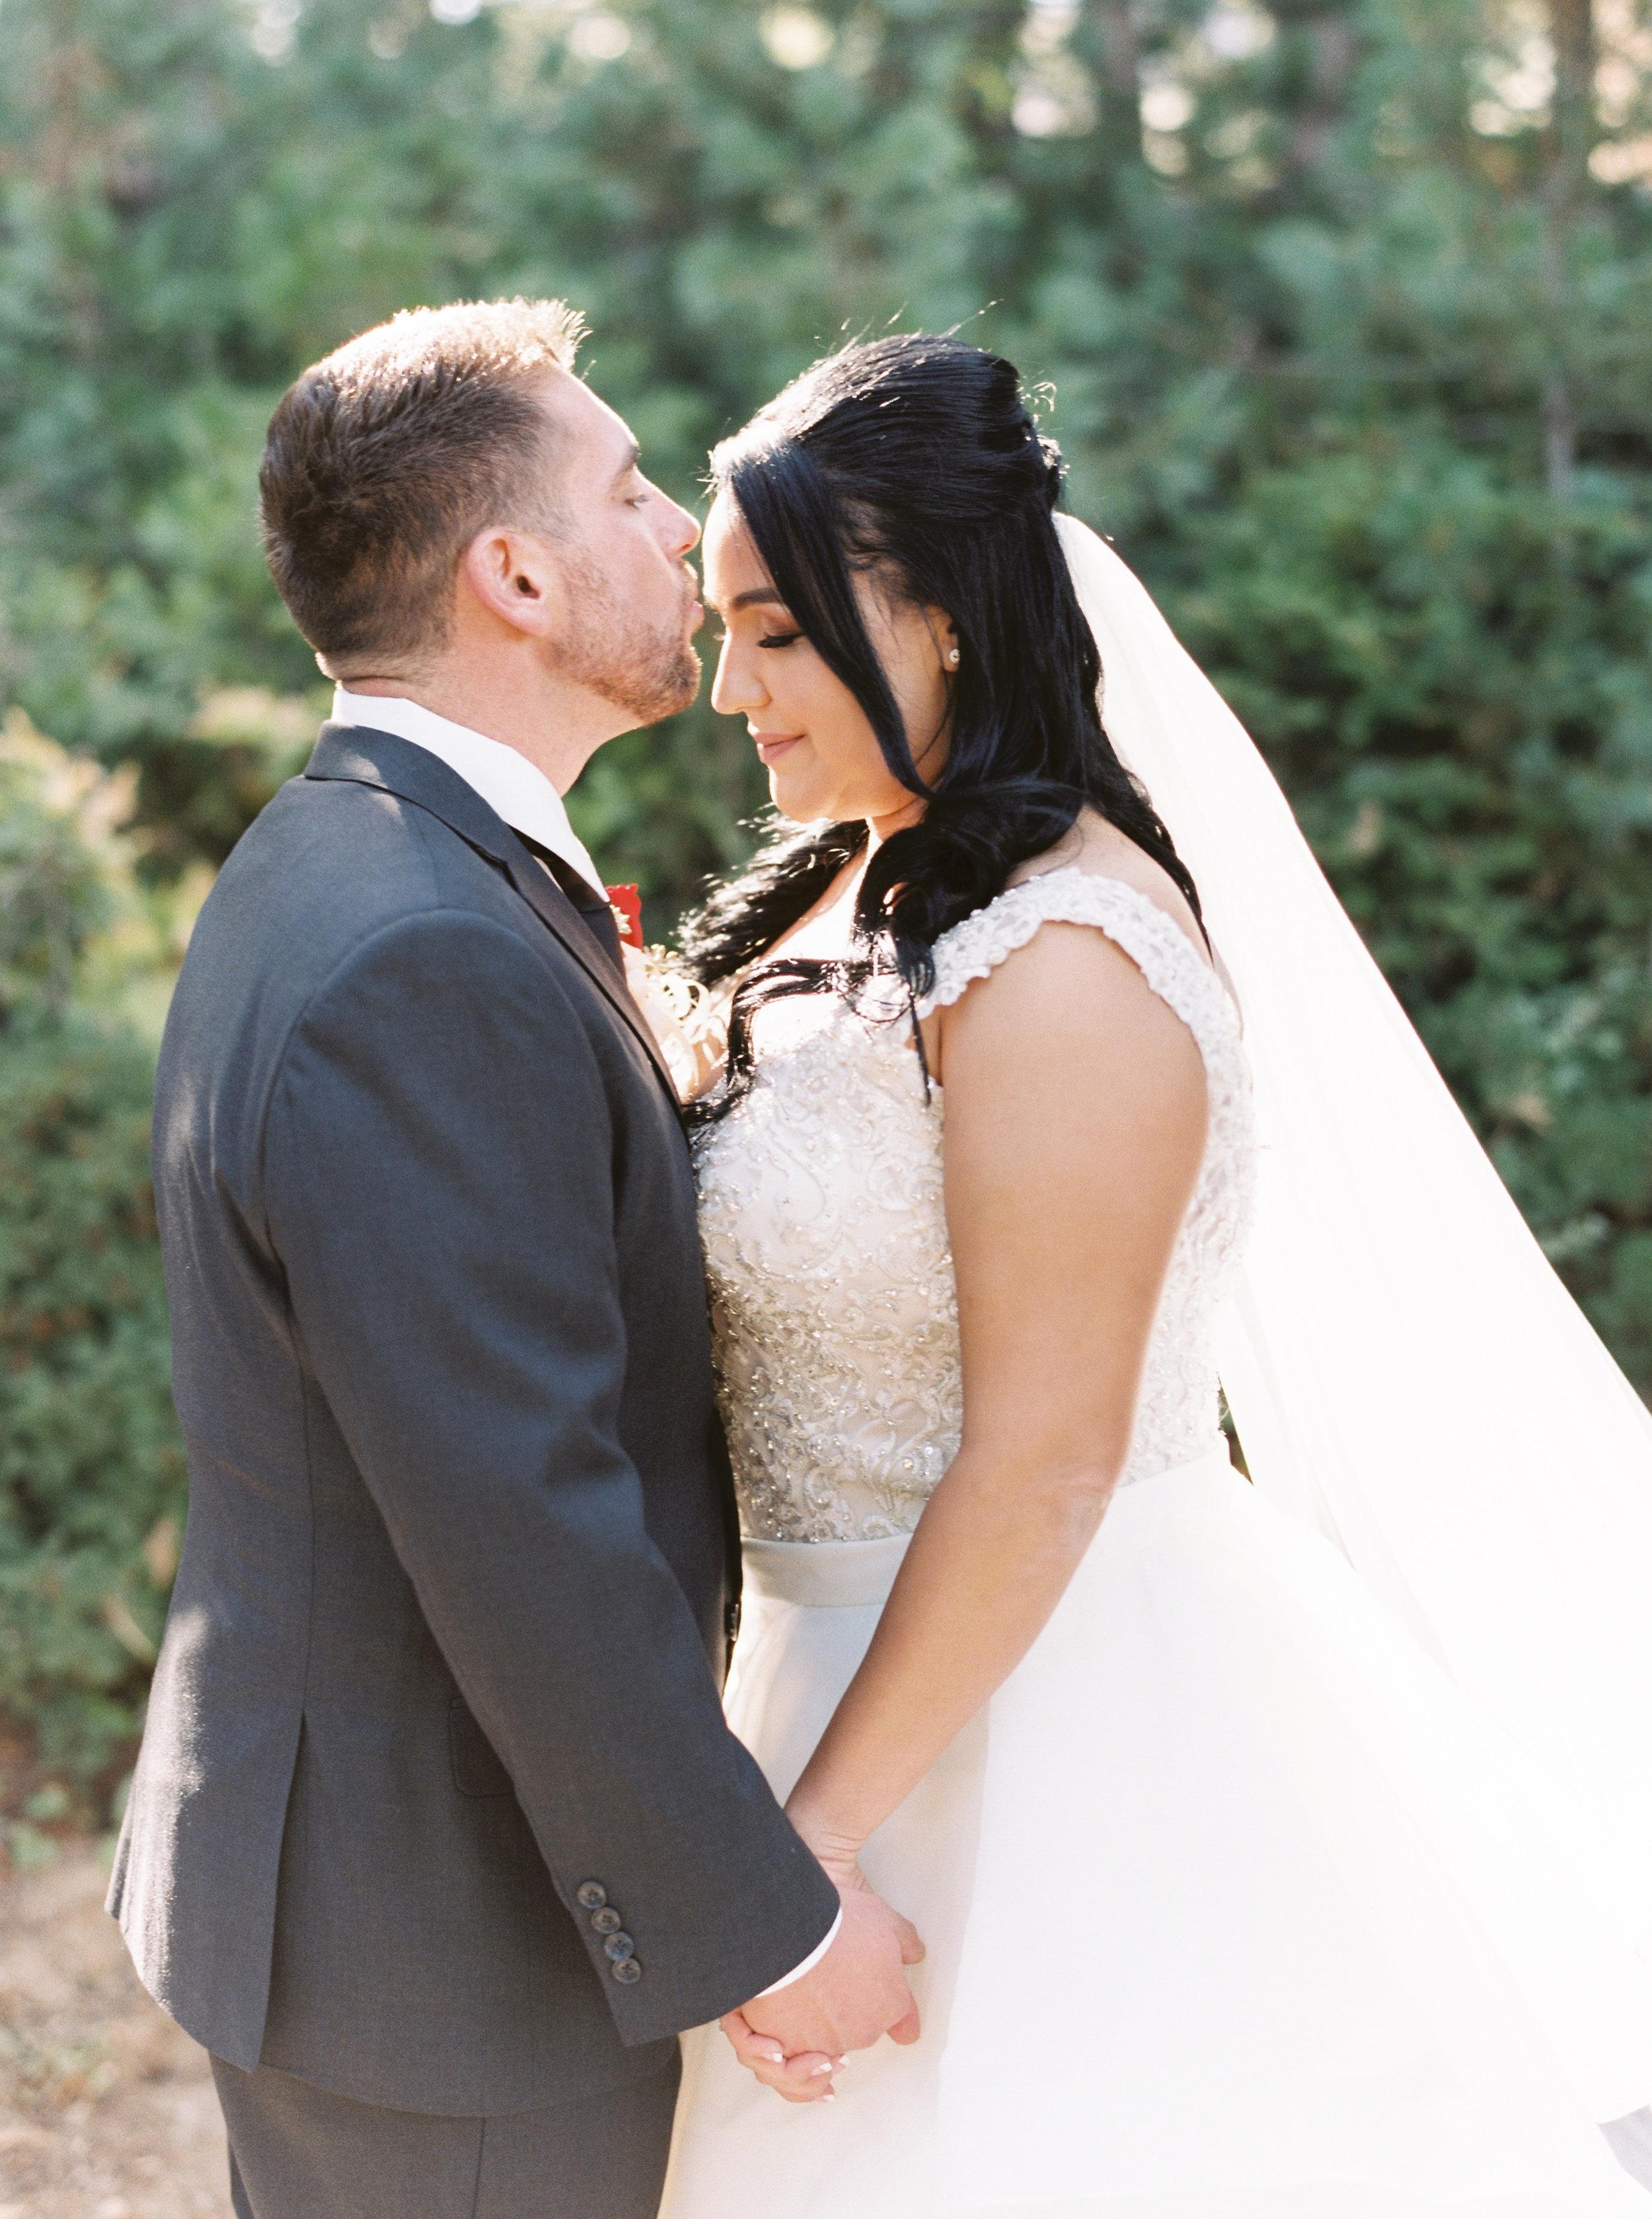 Tenaya-lodge-wedding-at-yosemite-national-park-california-37.jpg